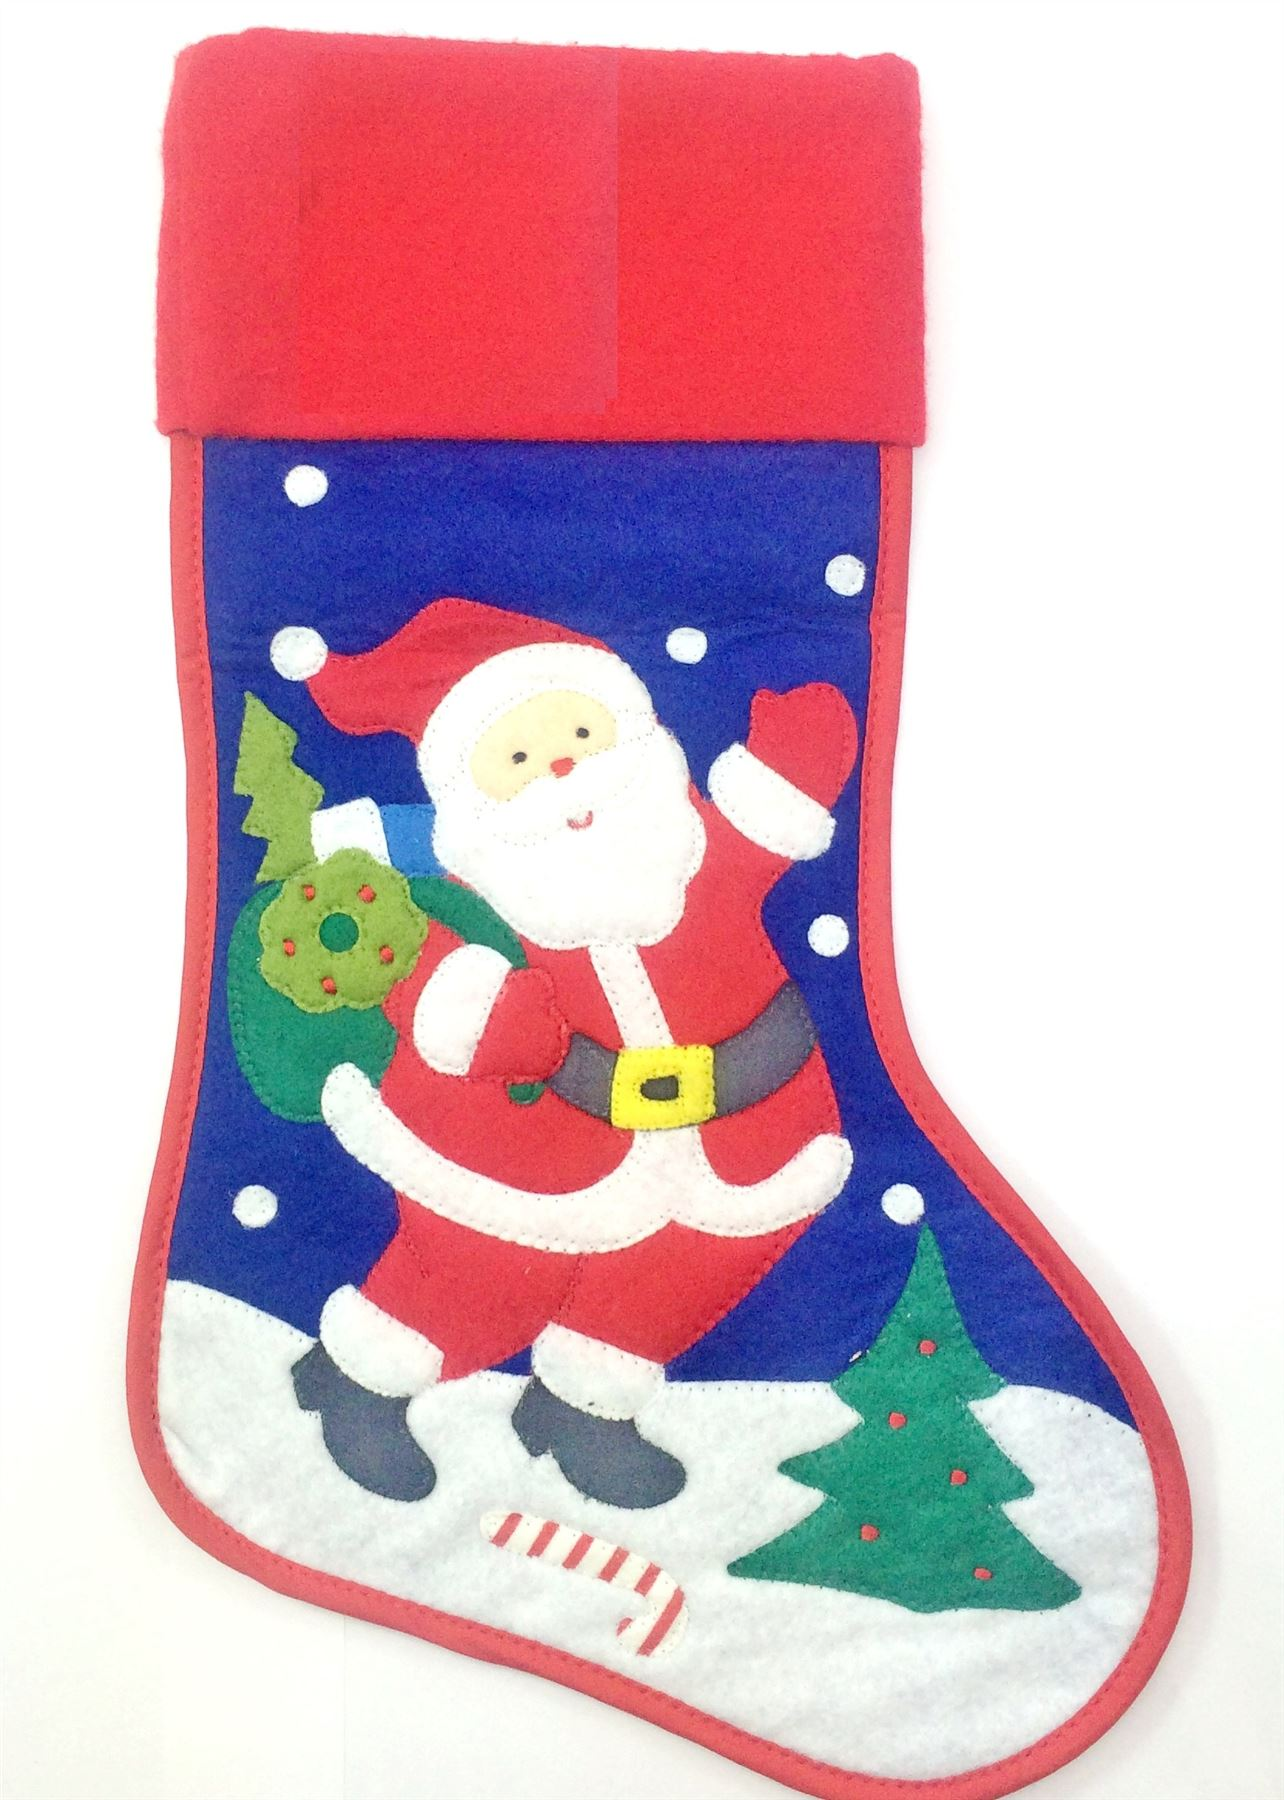 Festive Christmas Felt Stitched Stocking Cute Santa